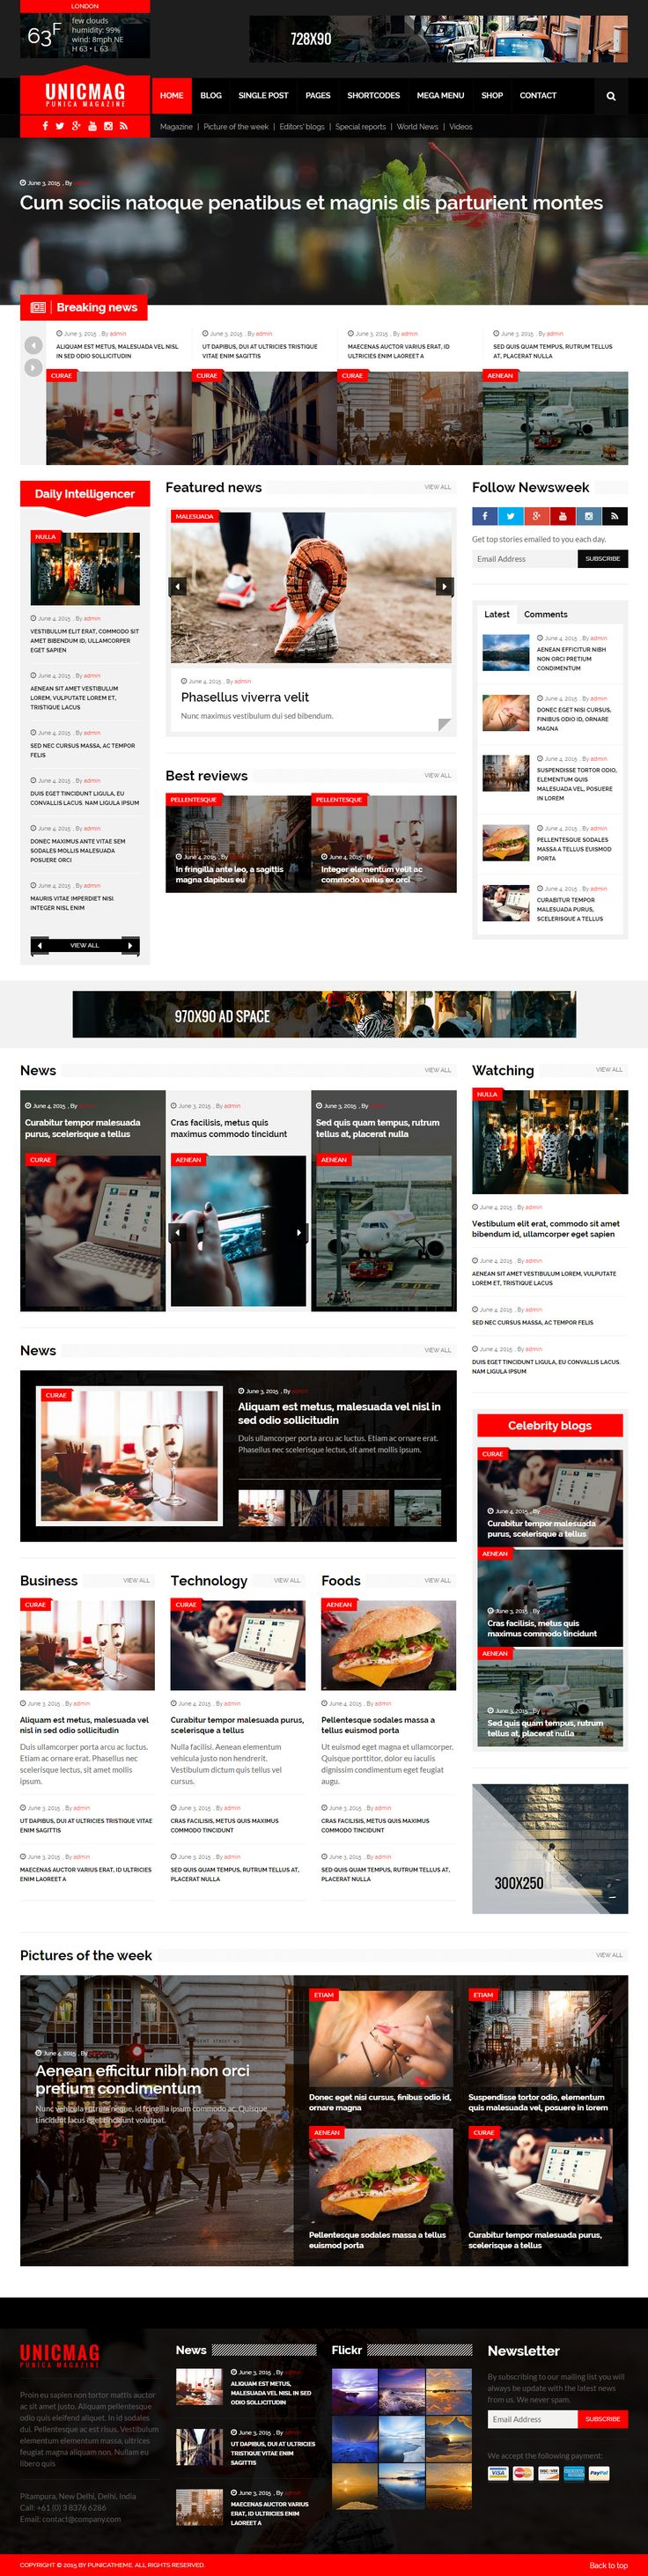 UnicMag is Premium full Responsive #WordPress #Magazine Theme. #RetinaReady. Bootstrap 3 Framework. WooCommerce. Google Fonts. Test free demo at: http://www.responsivemiracle.com/cms/unicmag-premium-responsive-magazine-wordpress-theme/